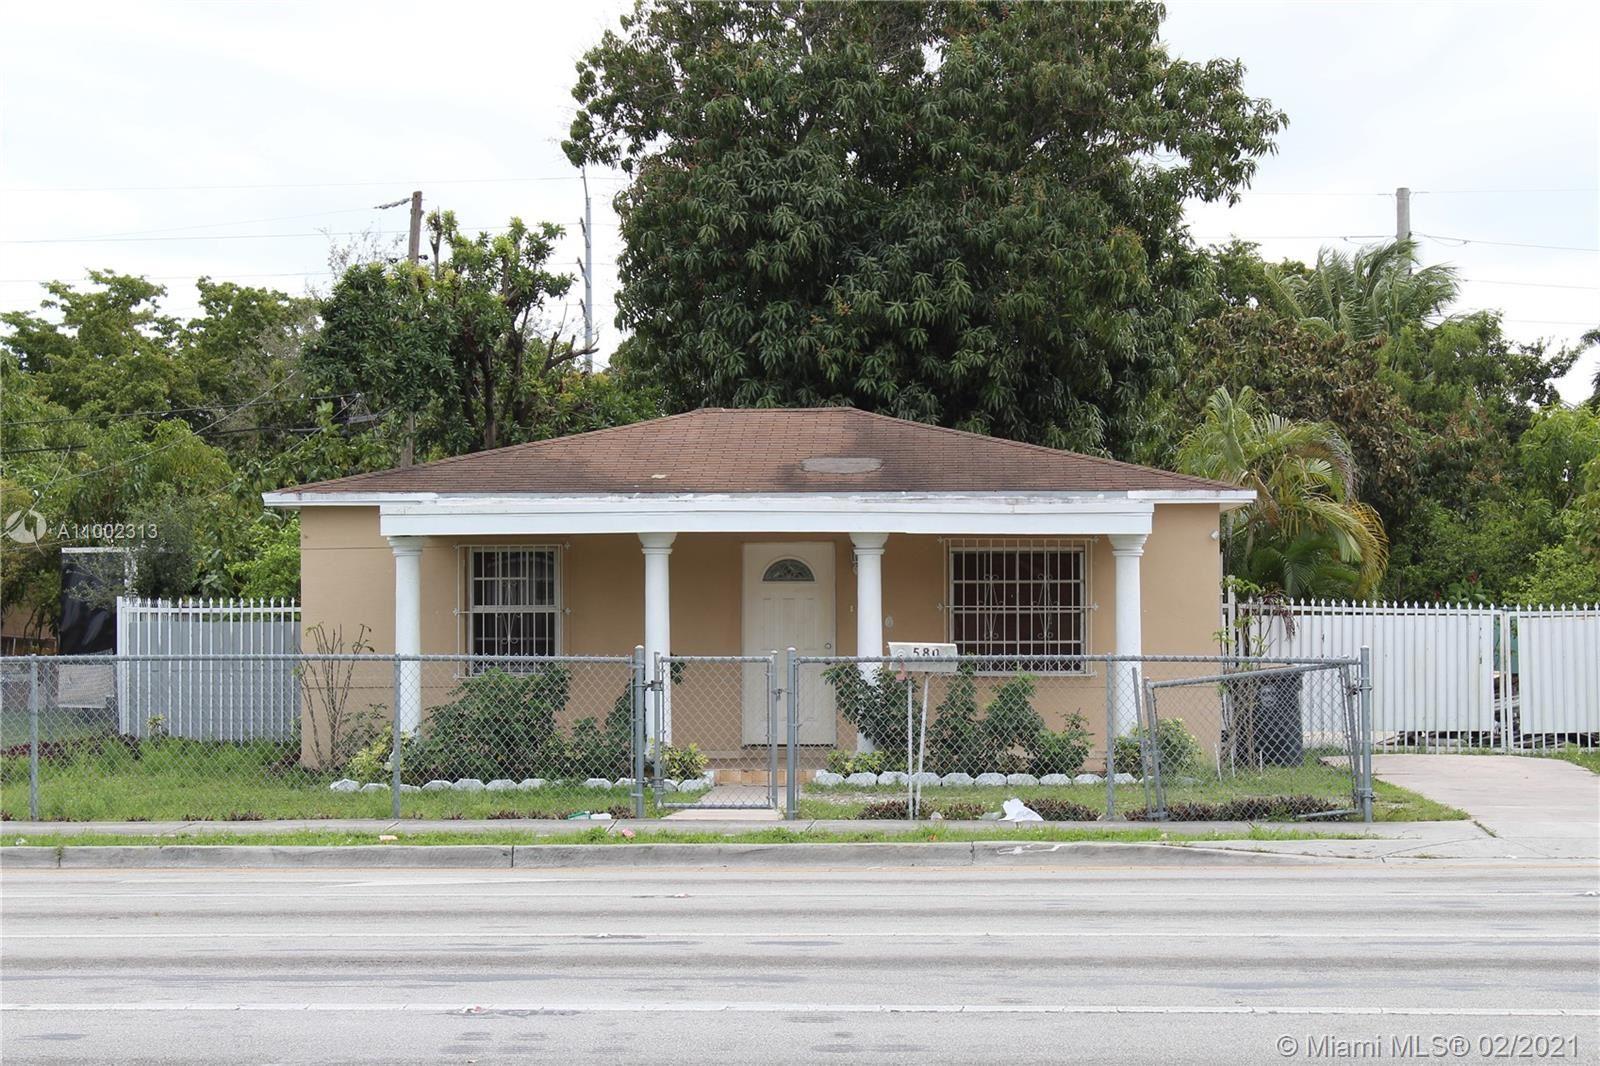 Photo of 580 Opa Locka Blvd, North Miami, FL 33168 (MLS # A11002313)